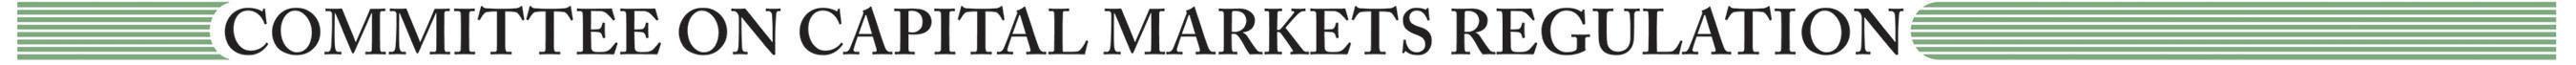 Committee on Capital Markets Regulation logo